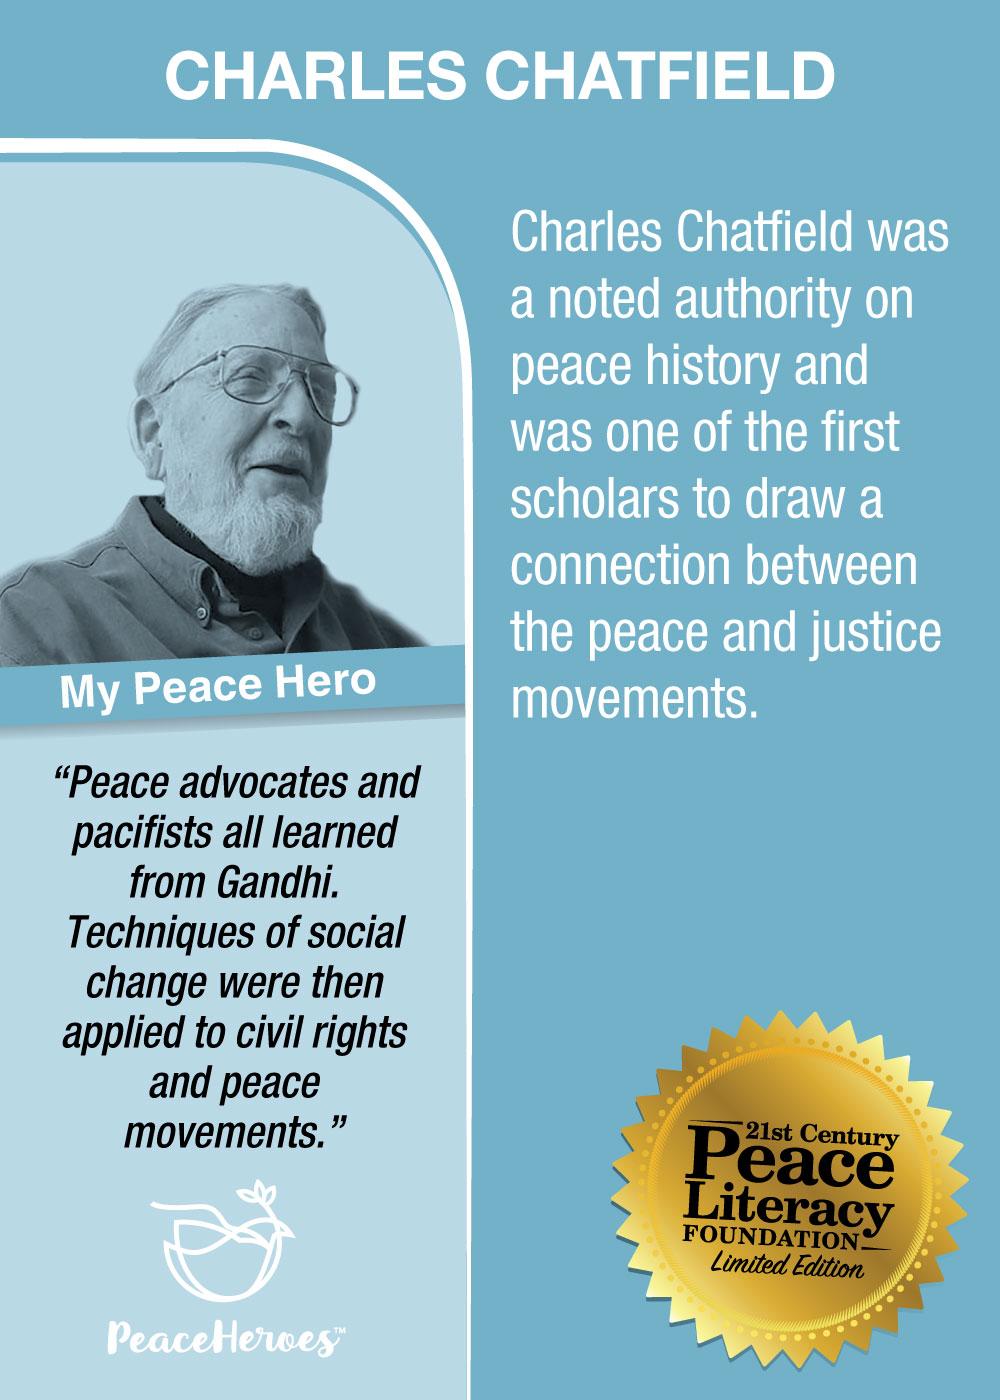 ChatfieldCharles.jpg